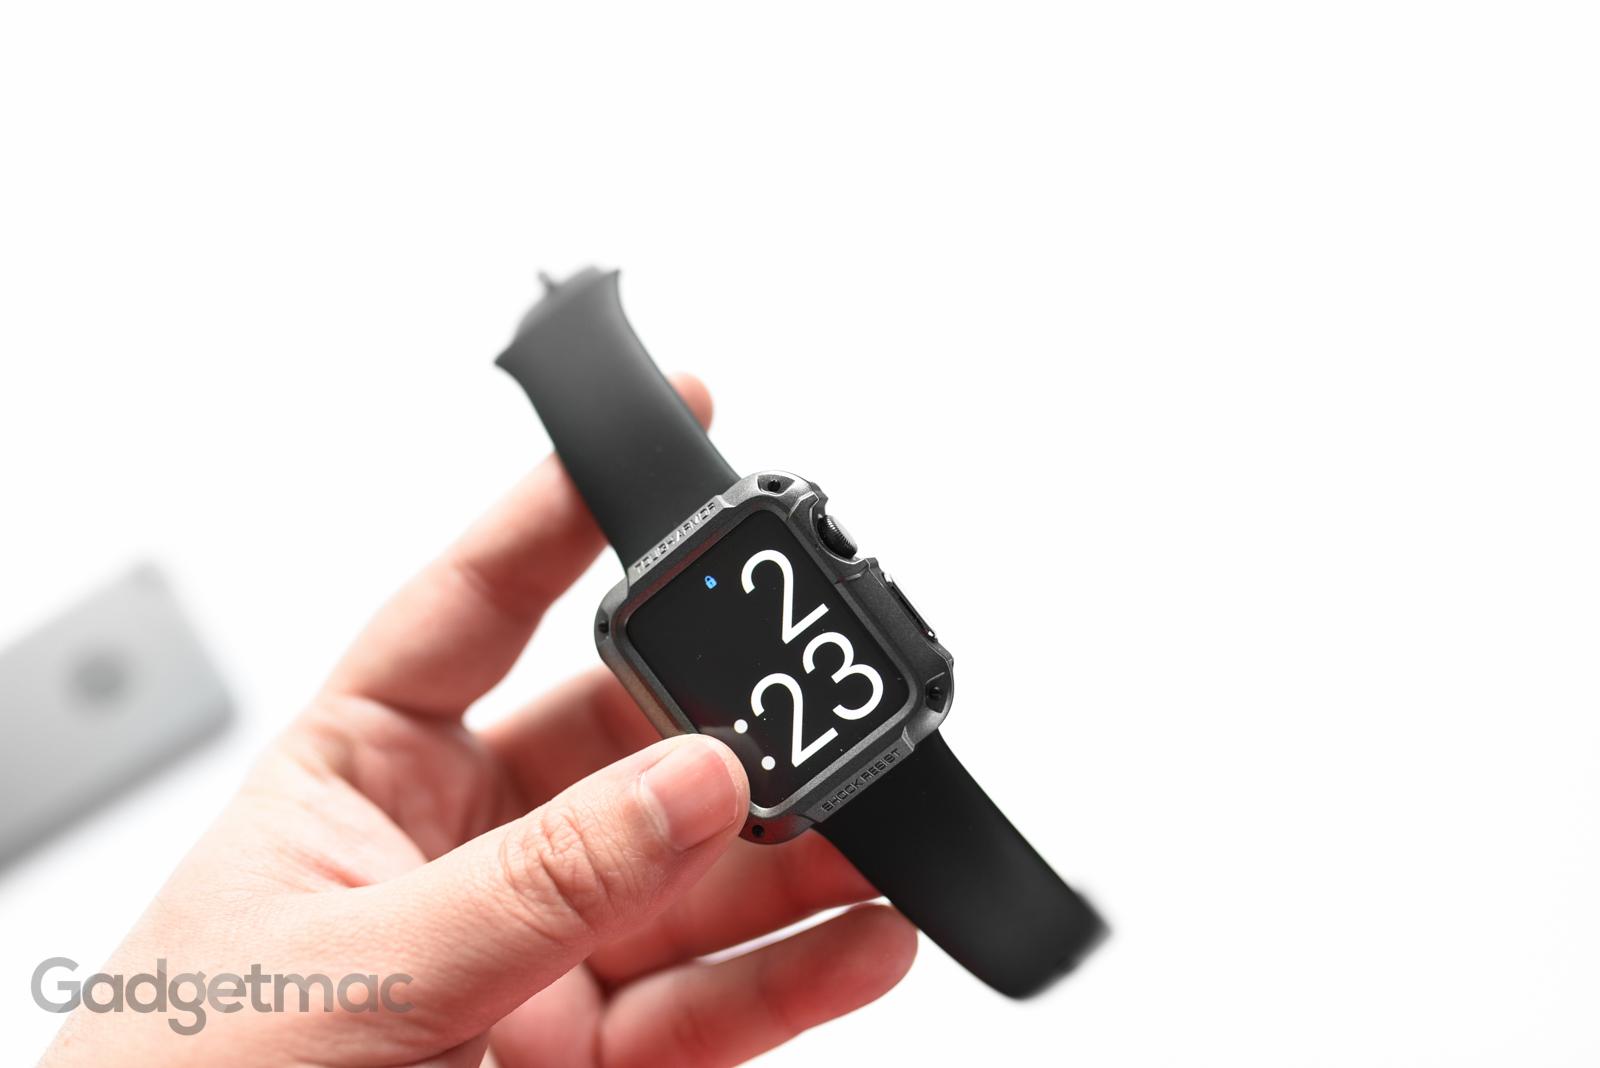 spigen-apple-watch-tough-armor-case-with-built-in-screen-protector-digital-crown.jpg